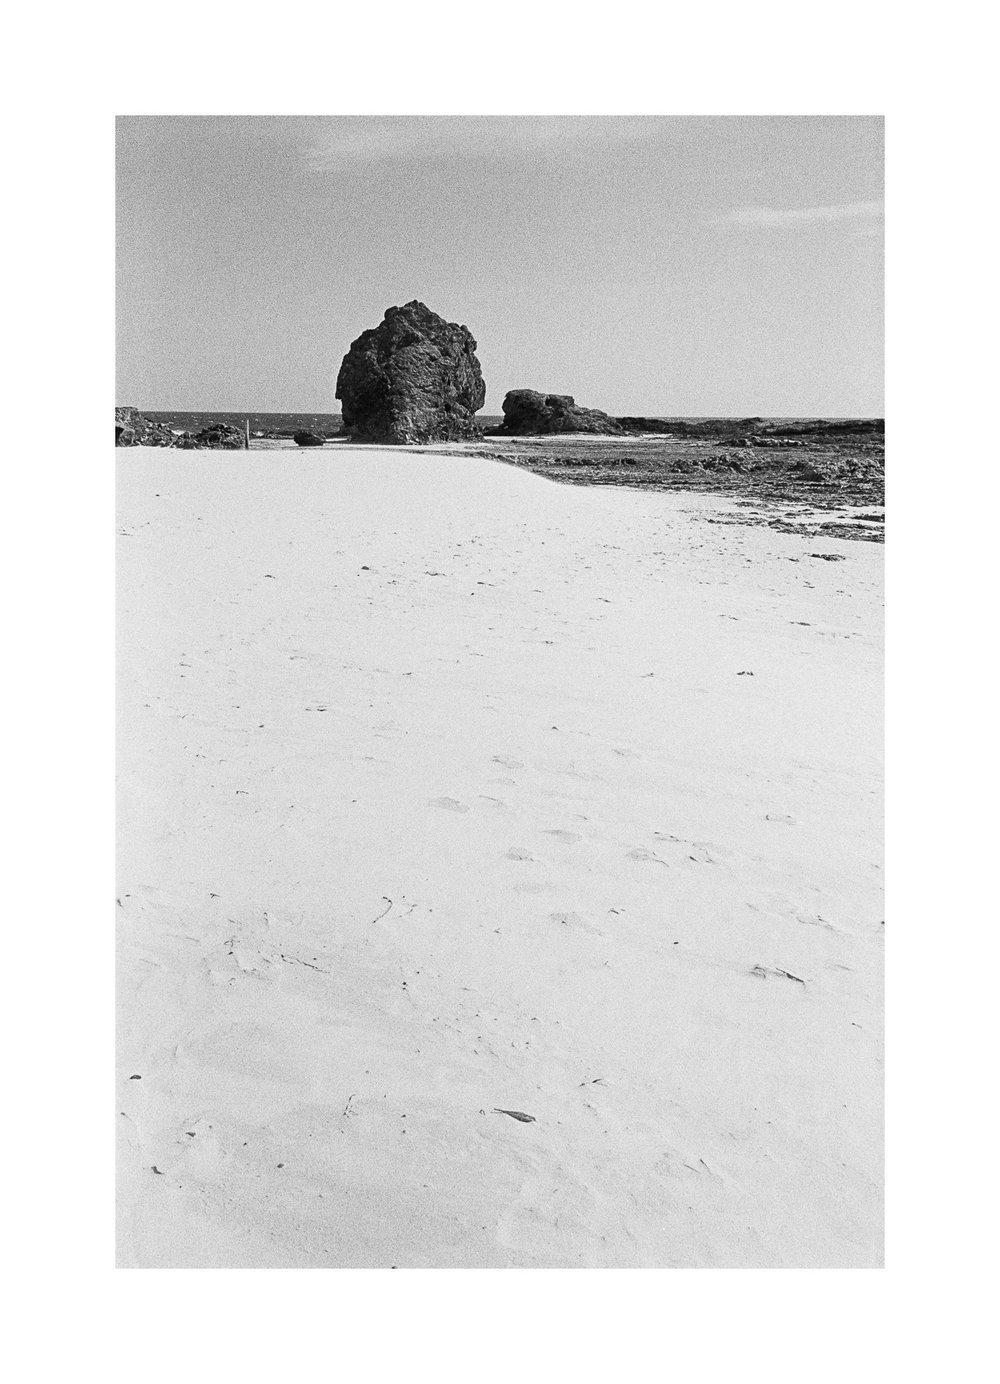 20181103 - Roll 263 - 019-Nick-Bedford,-Photographer-Black and White, Currumbin Rocks, Kodak TRI-X 400, Leica M7, Seascape, Voigtlander 35mm F1.7.jpg